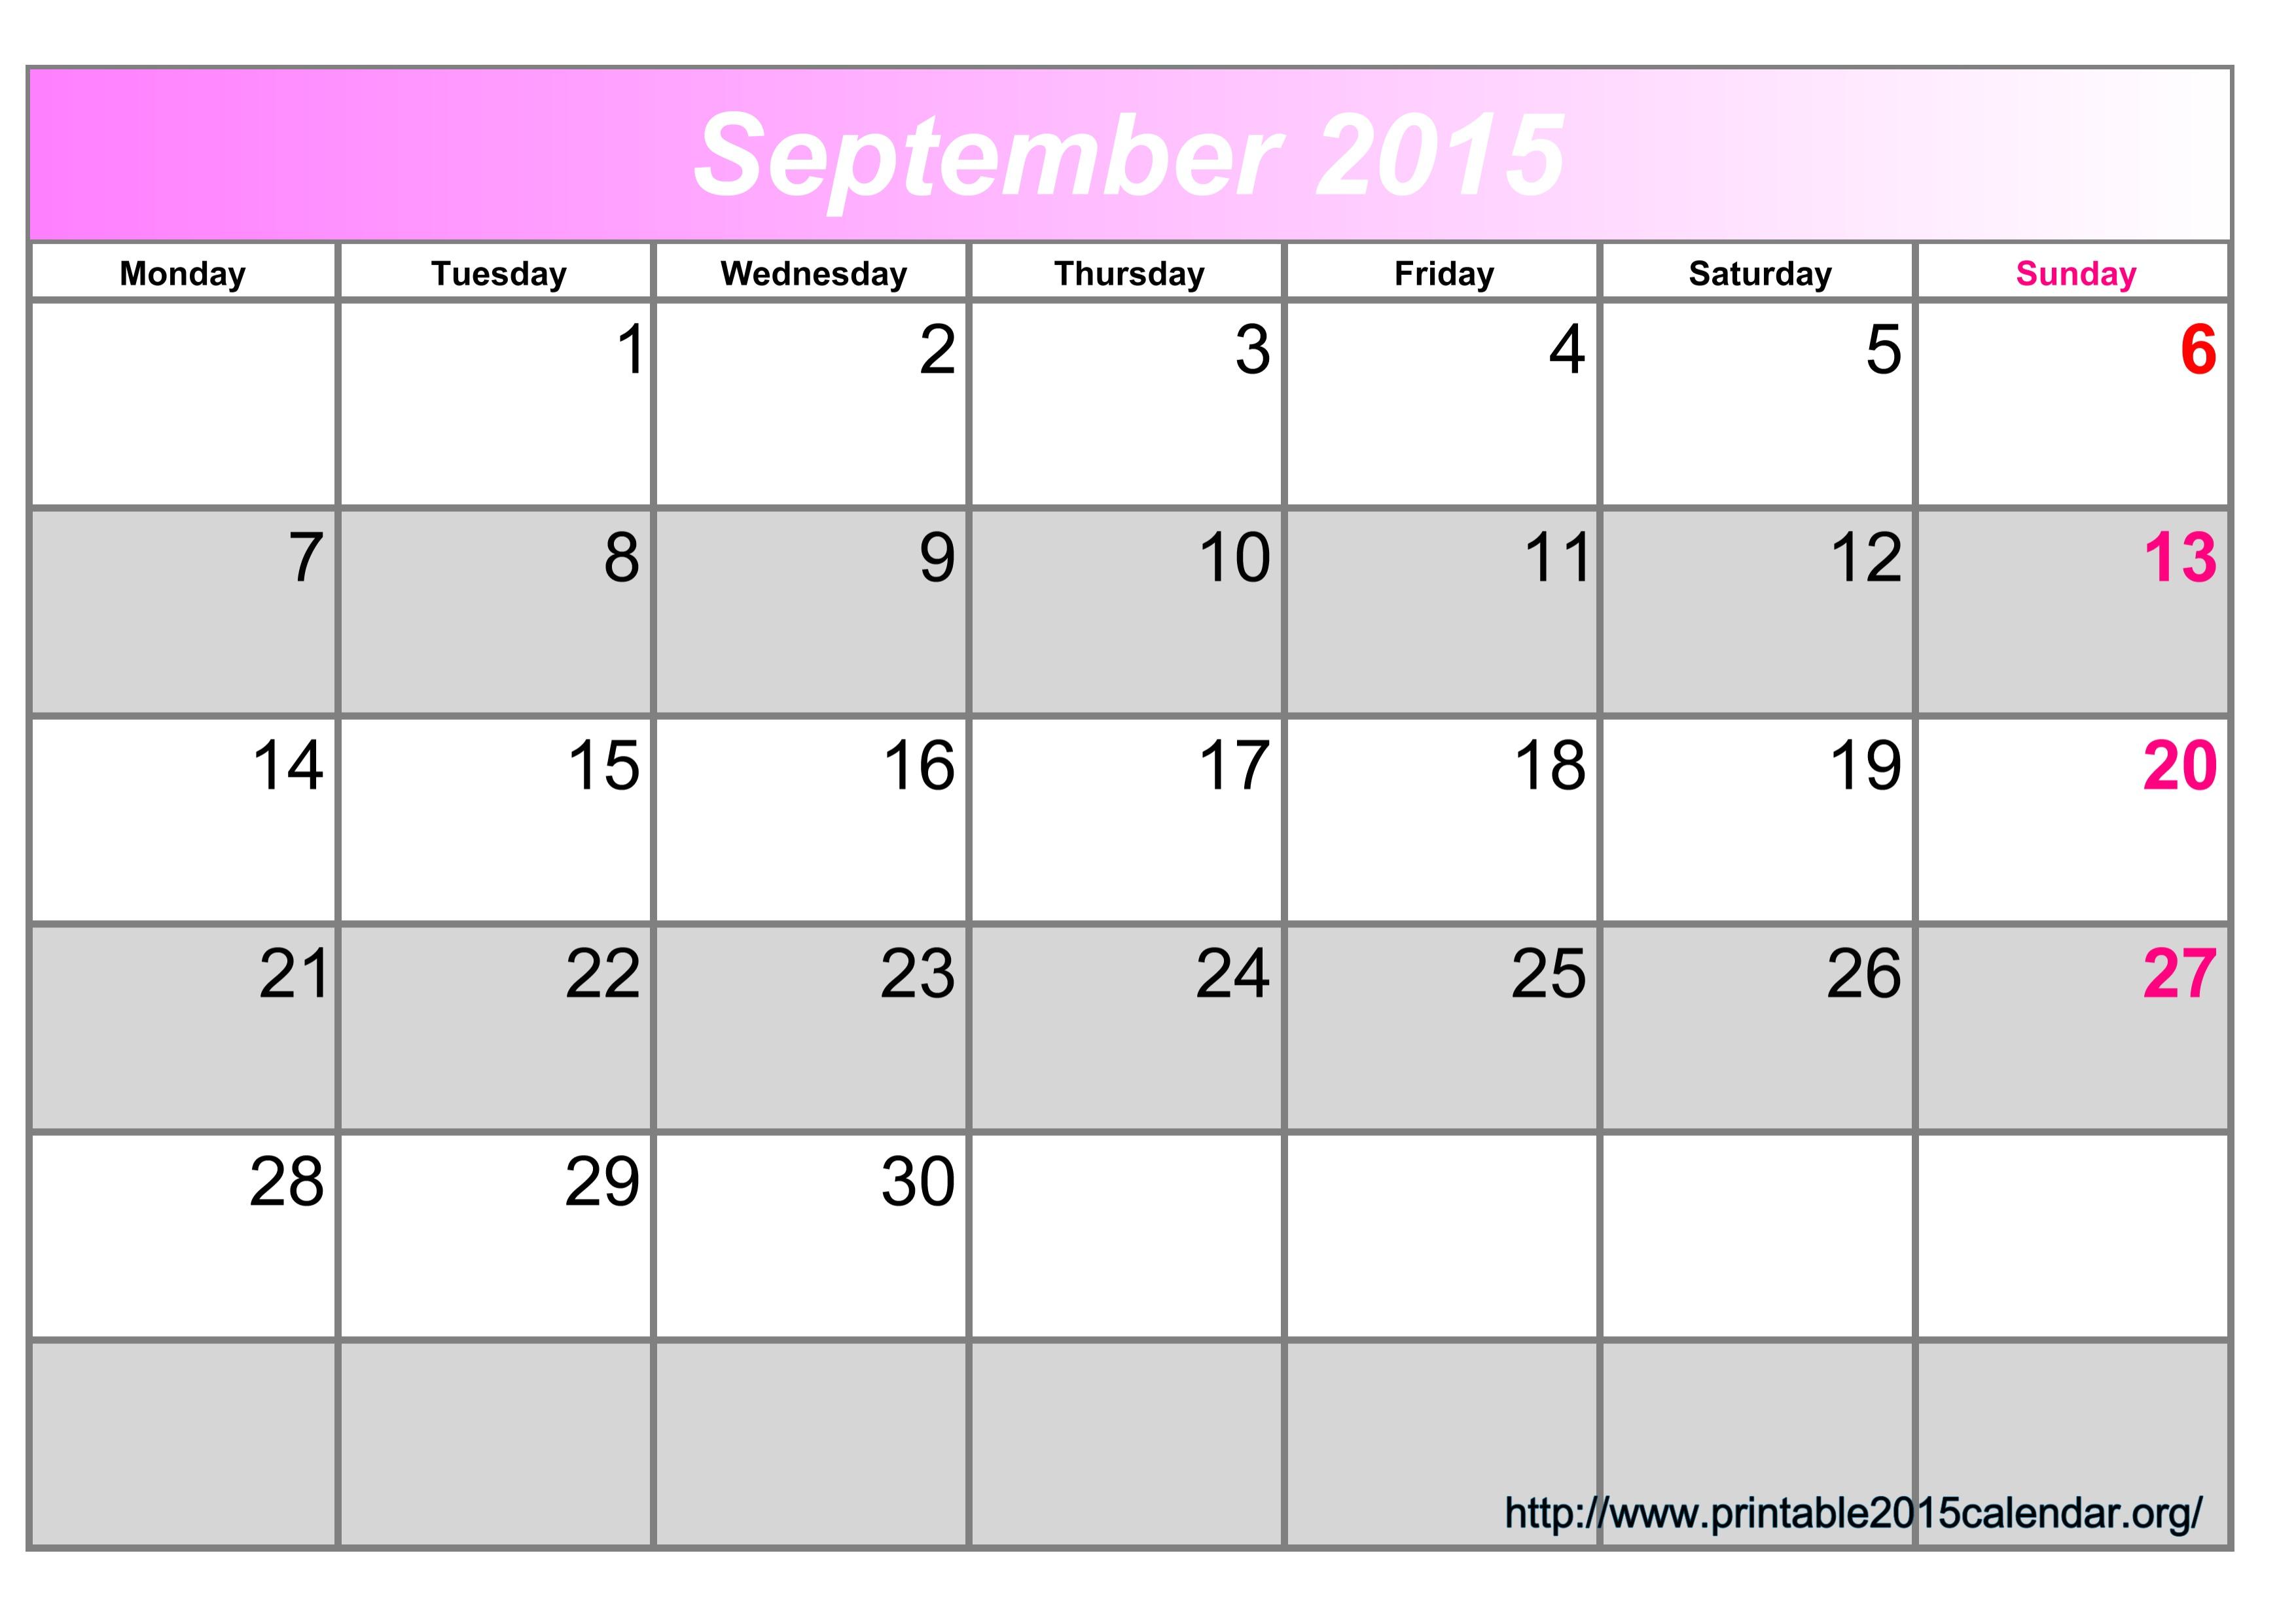 8 Images of September 2015 Calendar Printable Org